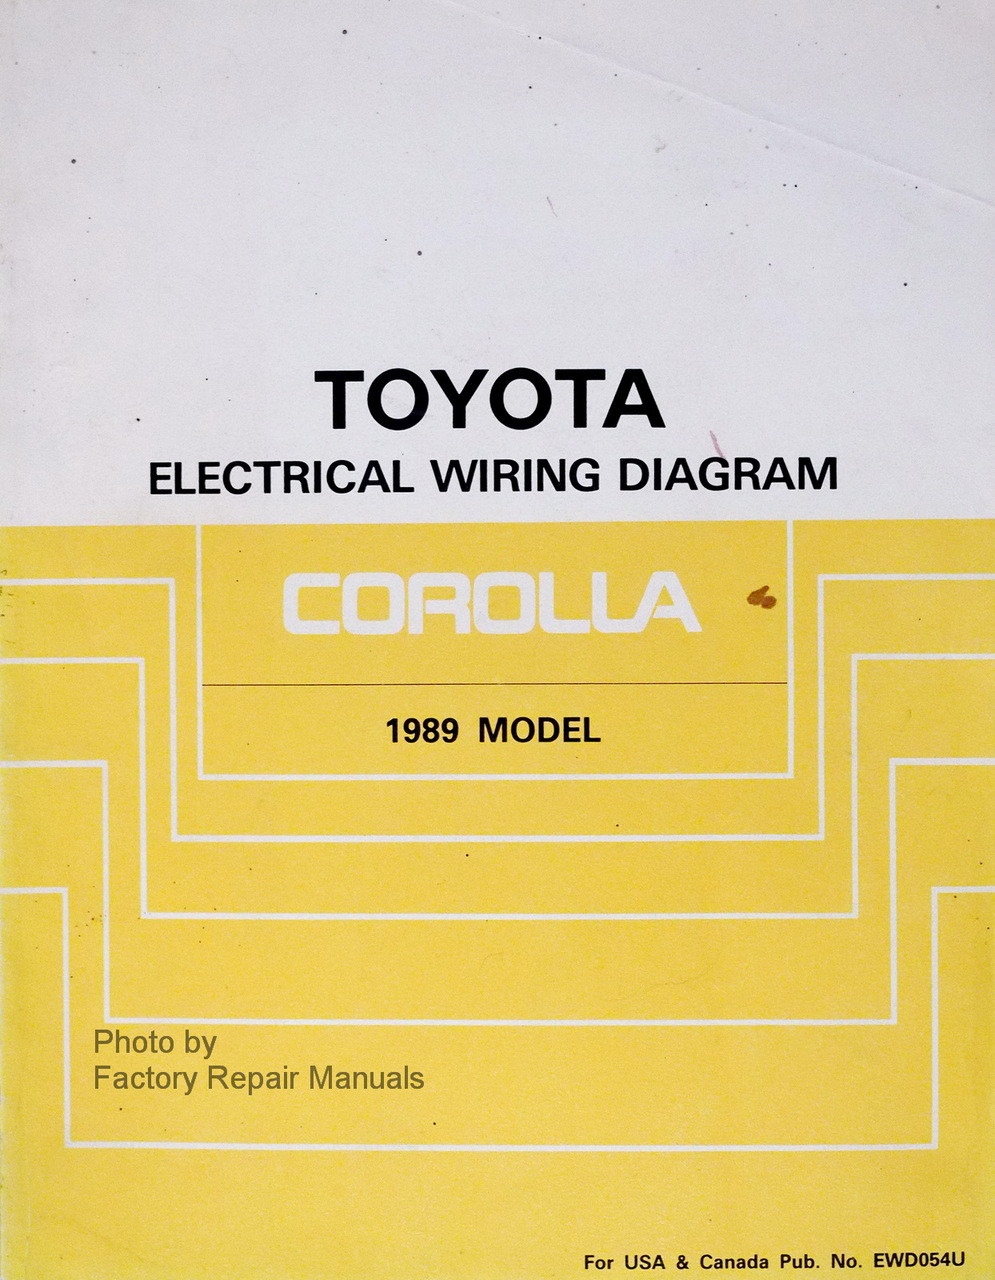 1989 Toyota Corolla Electrical Wiring Diagrams Manual